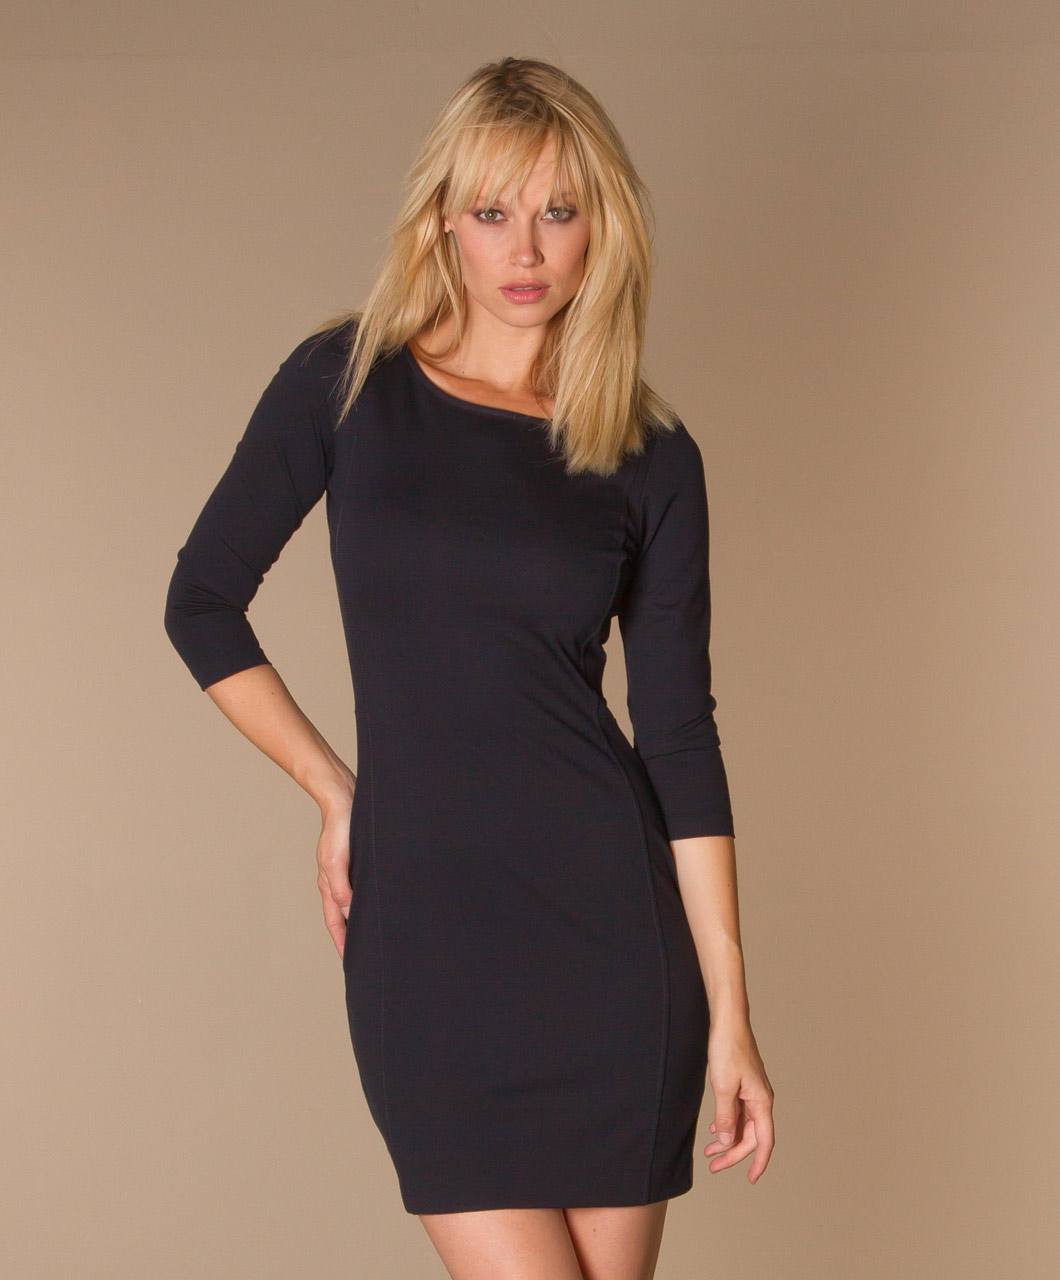 Filippa k tailored jersey dress black